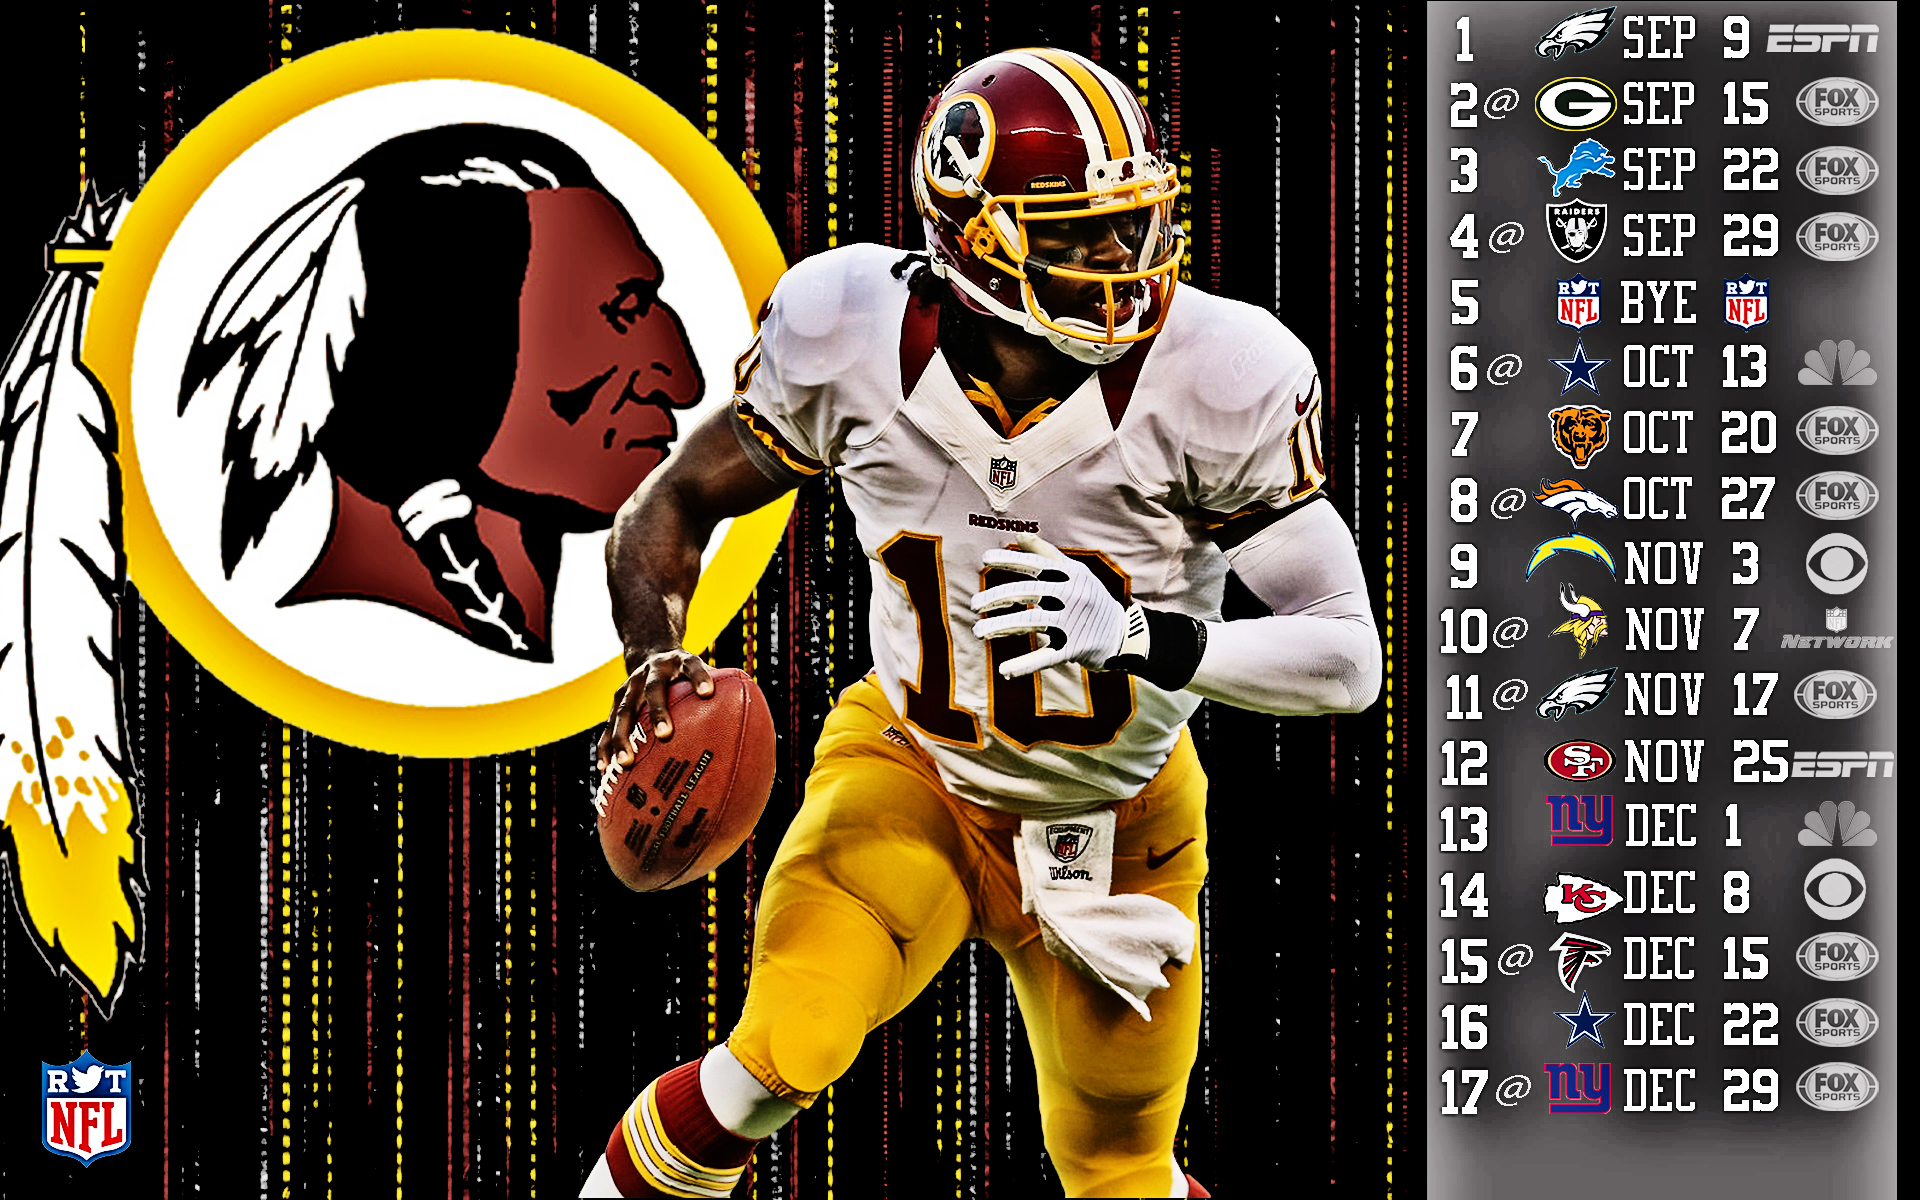 2013 Washington Redskins football nfl wallpaper 1920x1200 130436 1920x1200